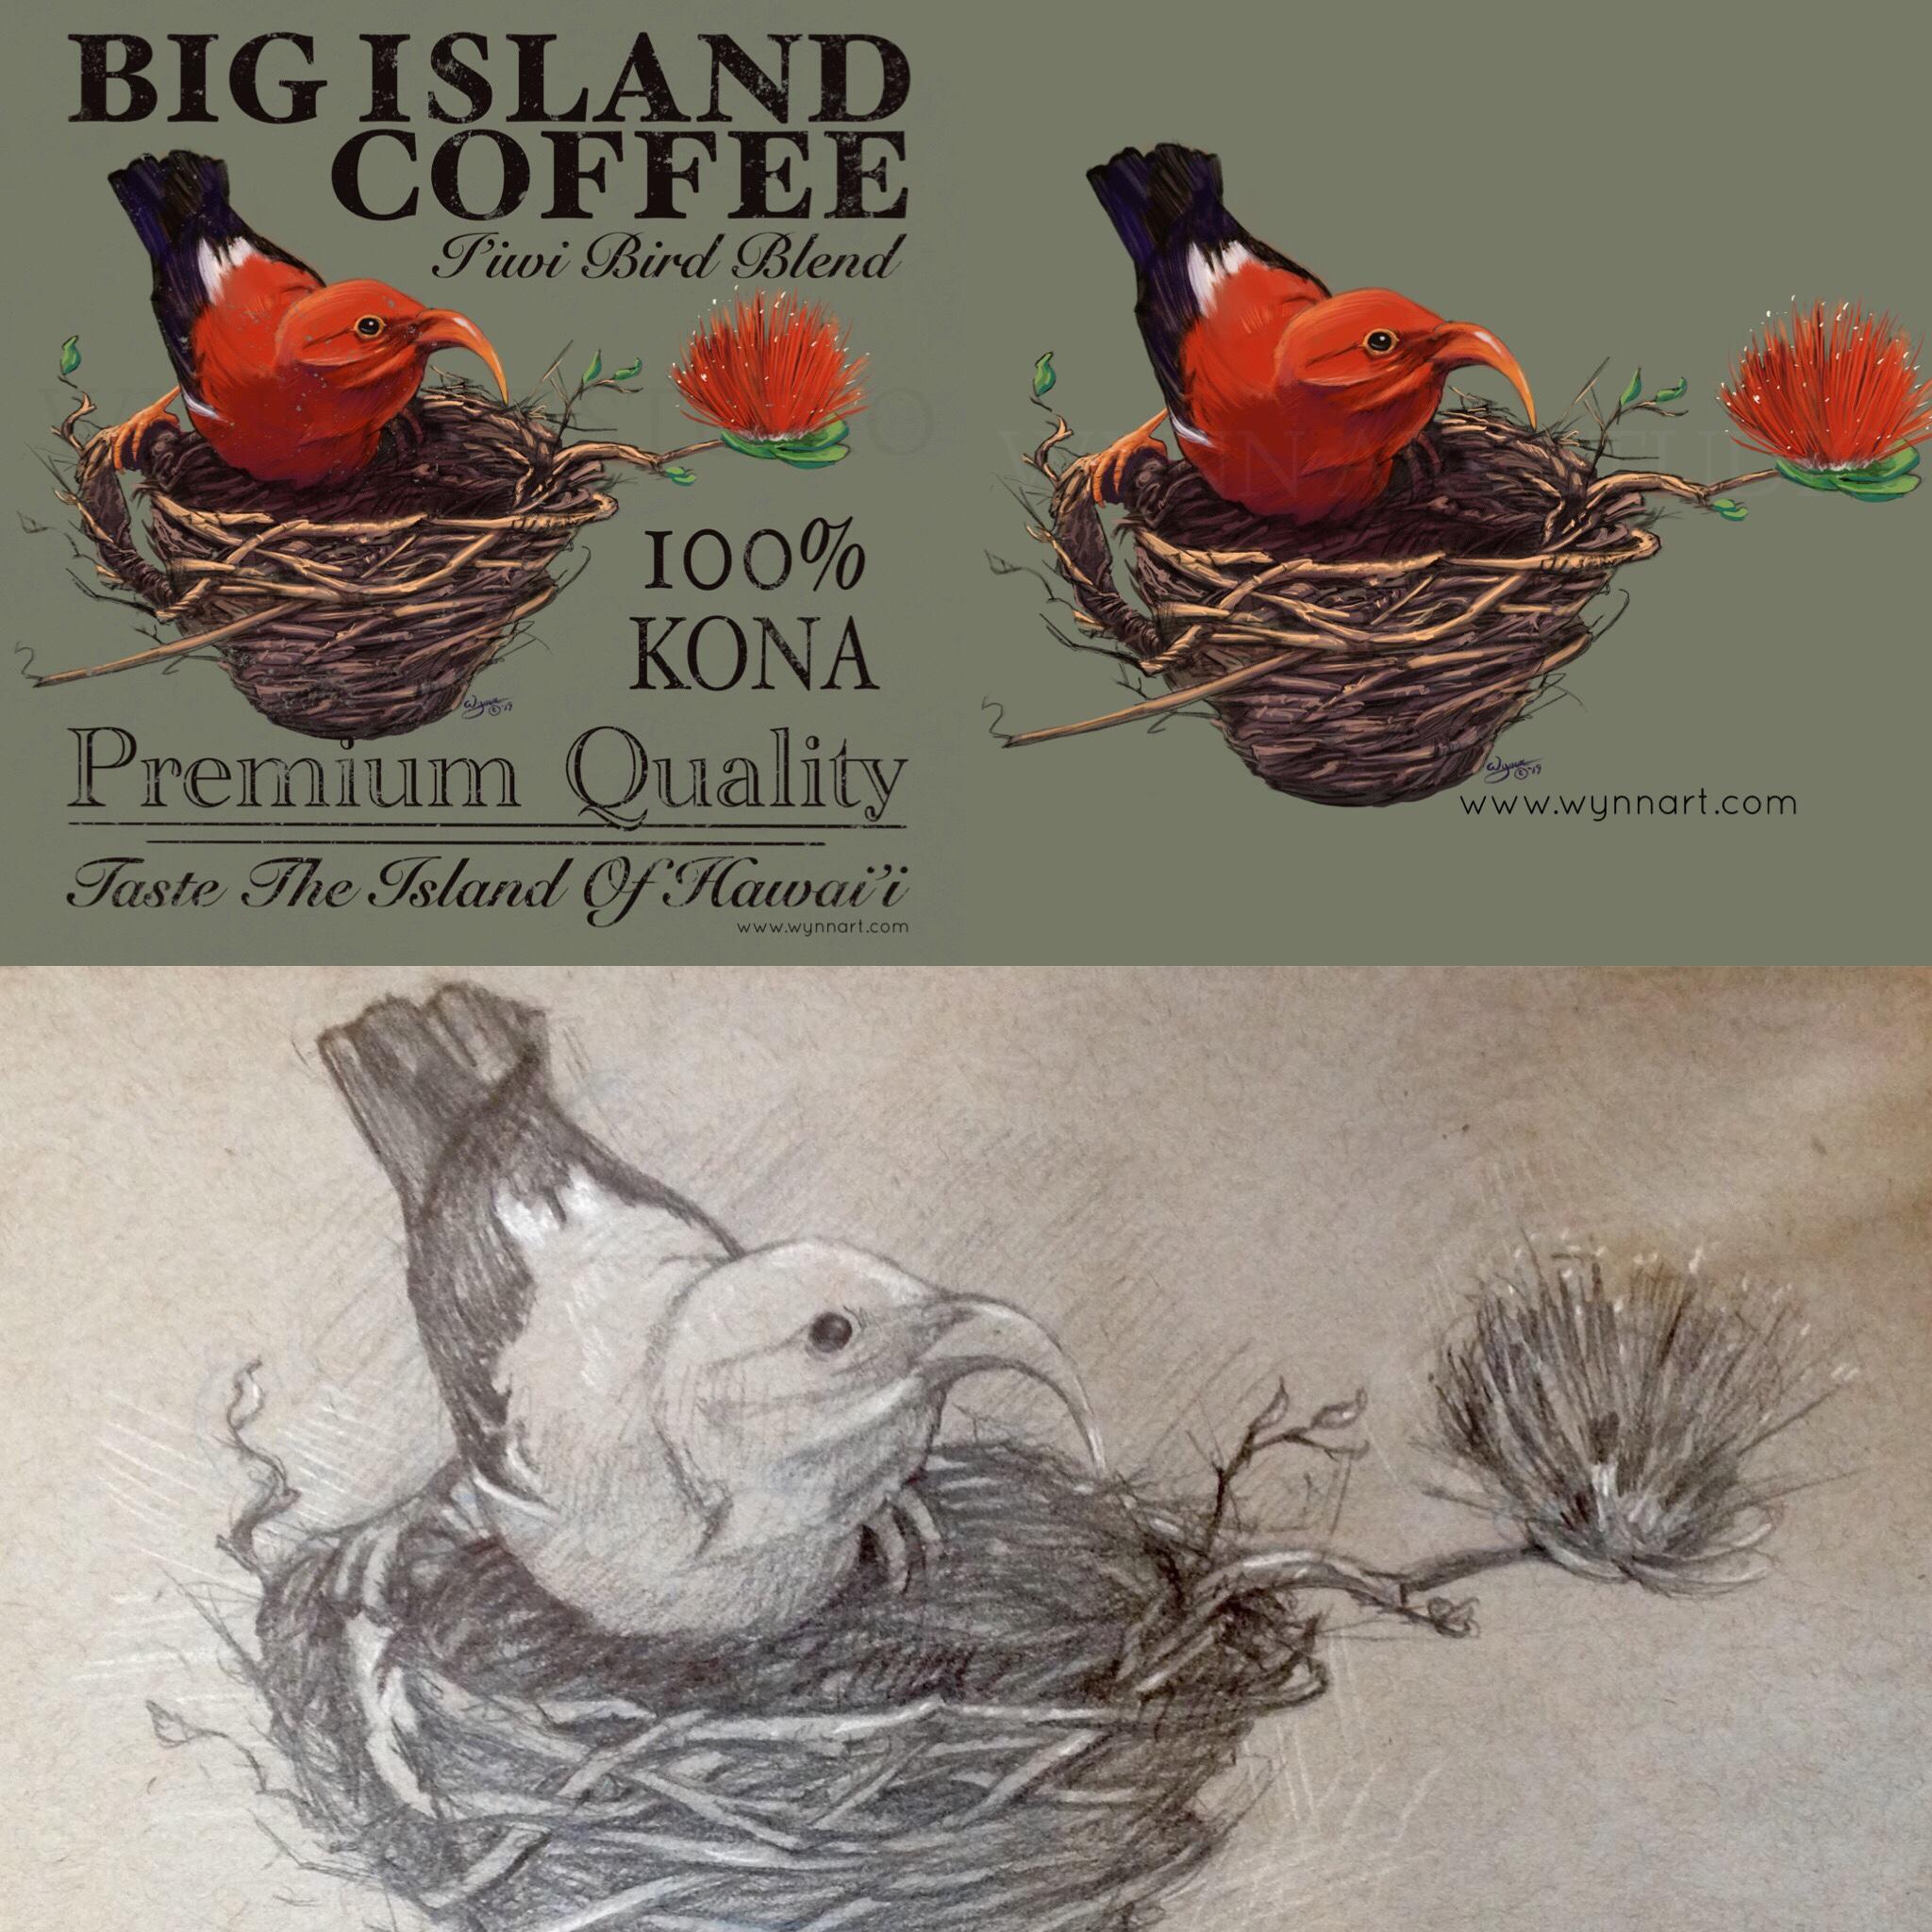 The magical Island of Hawaii, where the i'iwi bird, ohia-lehua and Kona coffee grow.